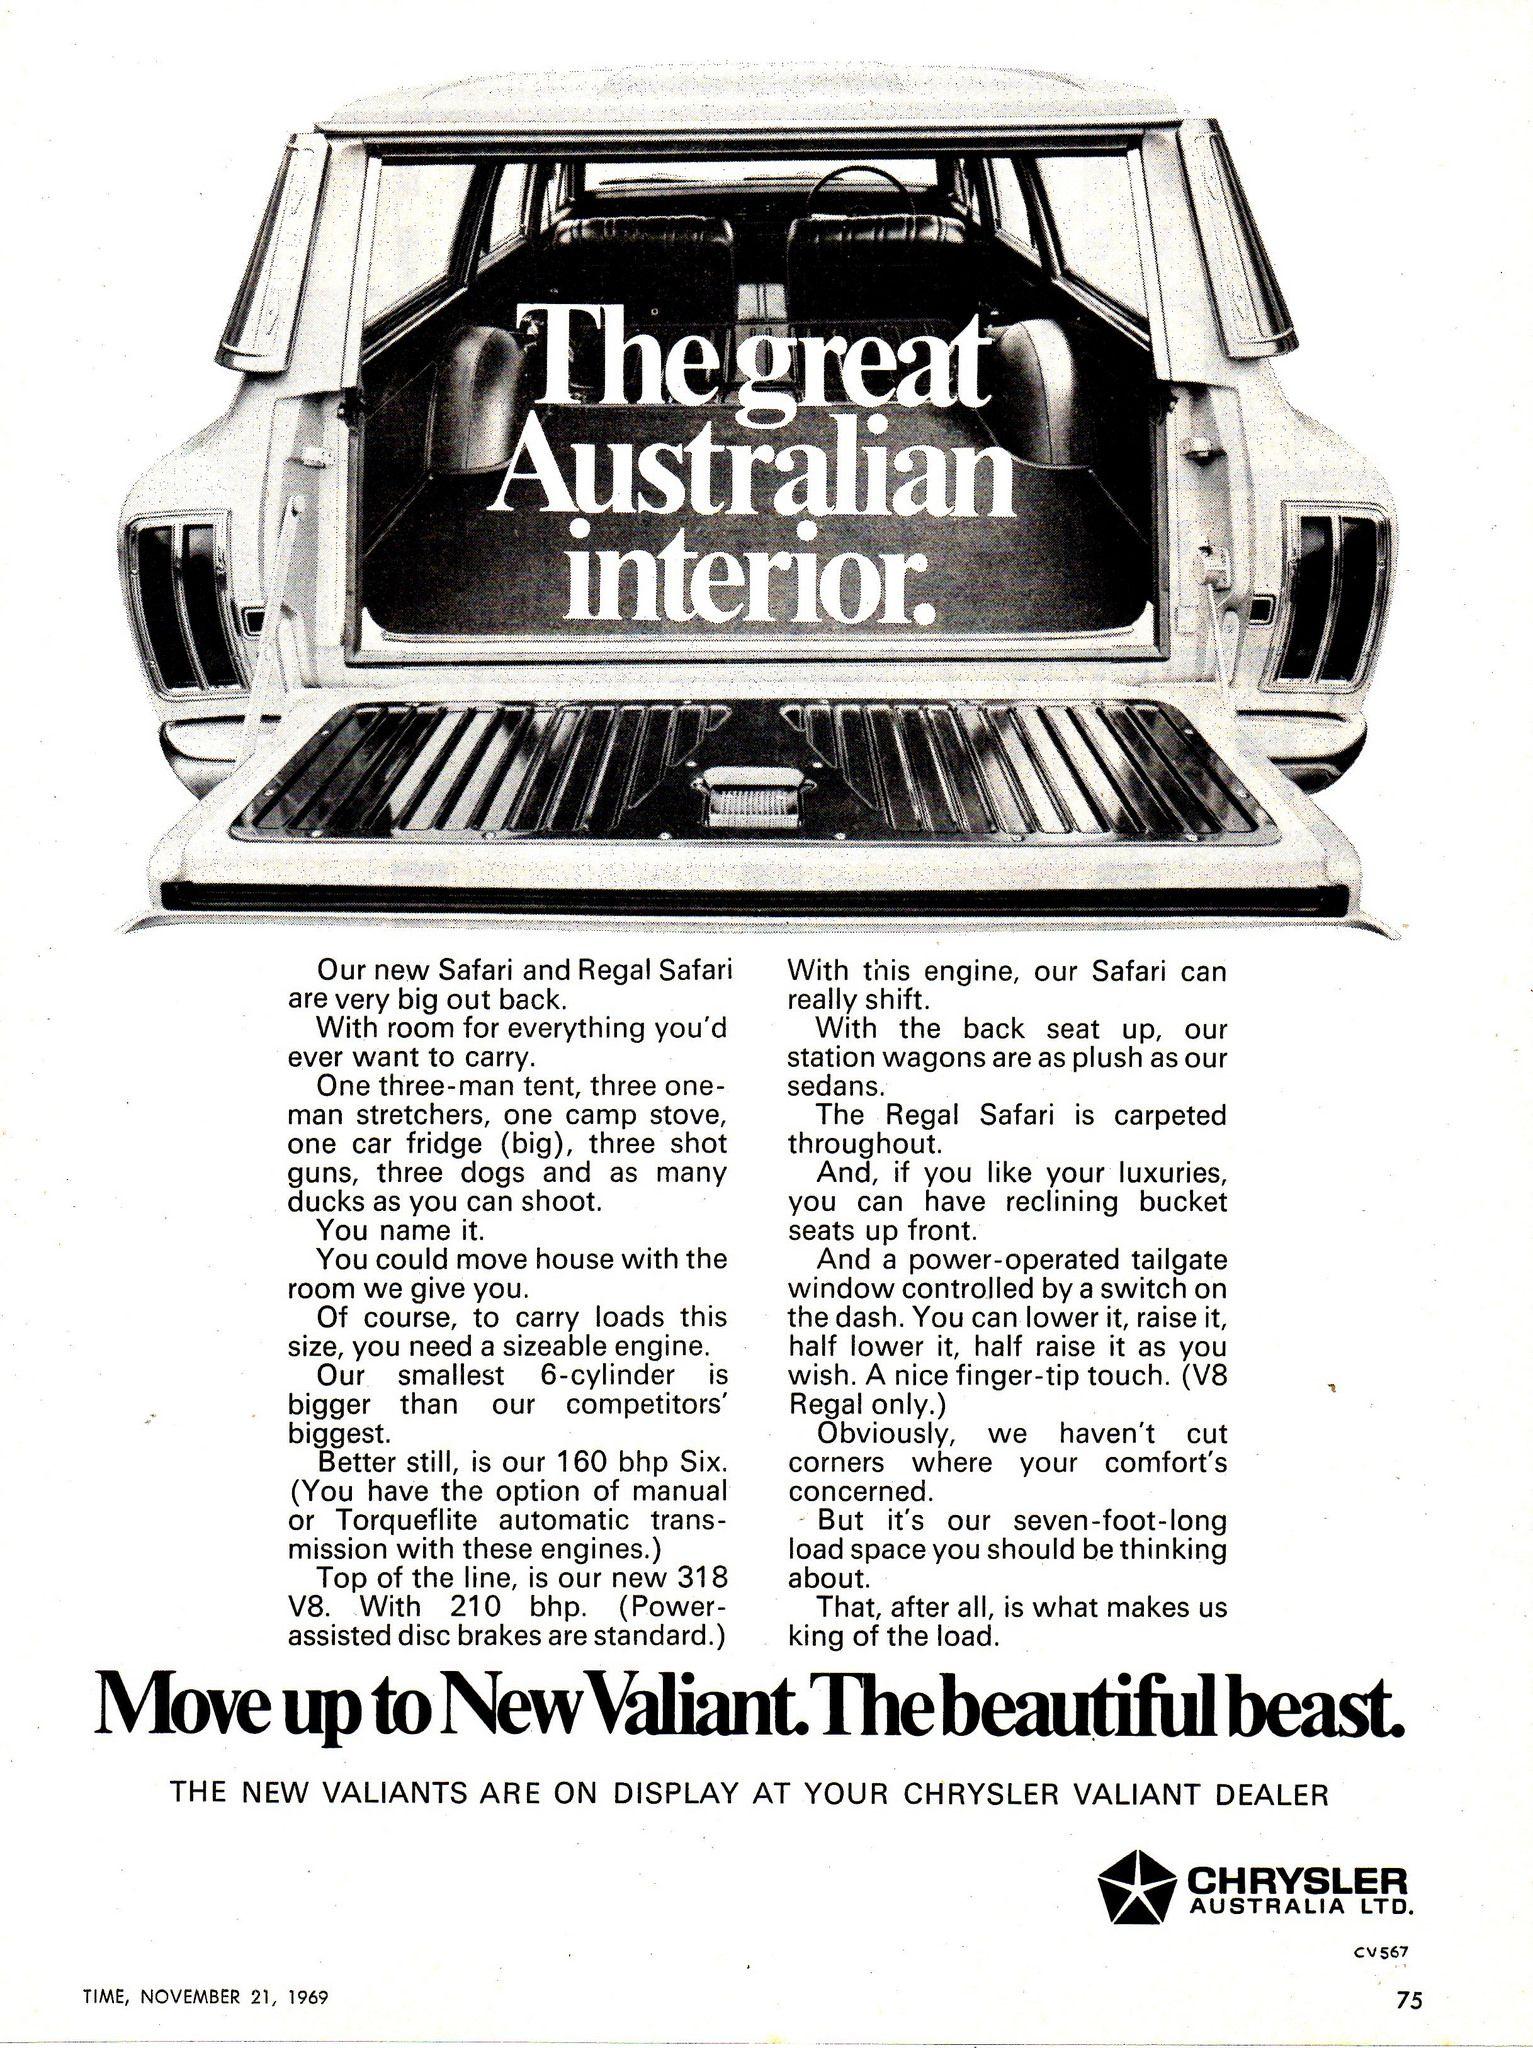 1969 vf chrysler valiant 225 regal safari aussie original magazine advertisement